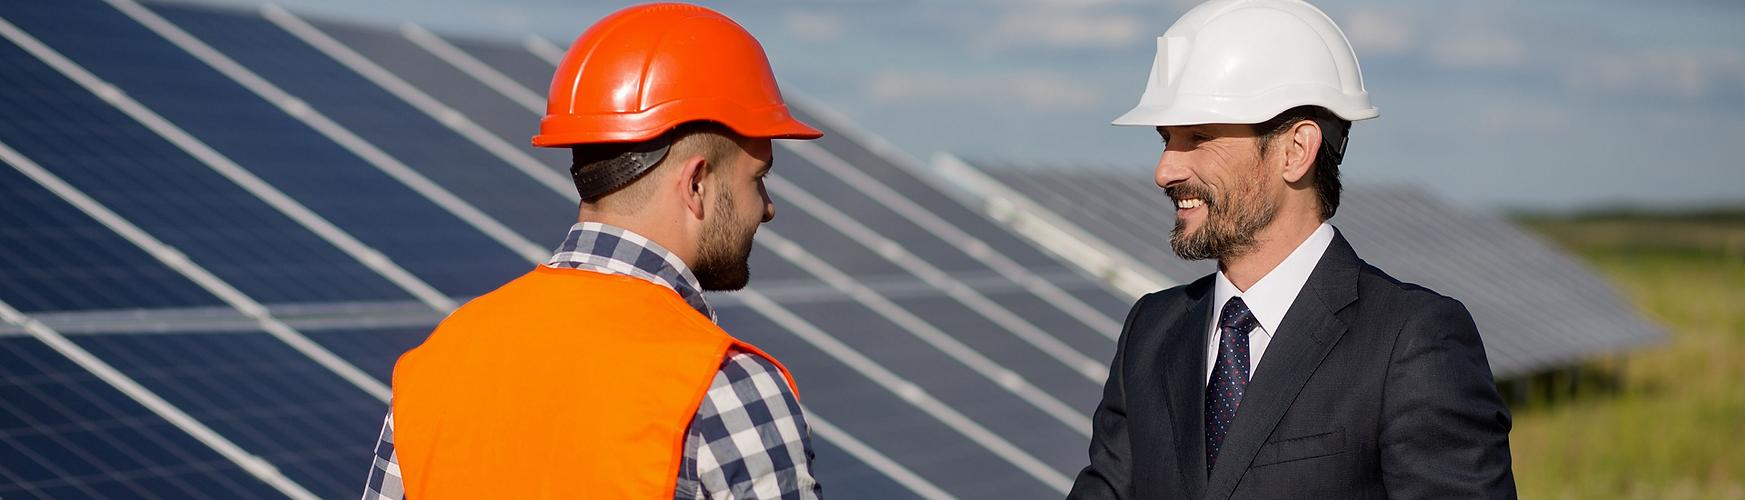 Consulenza gratuita Fotovoltaico